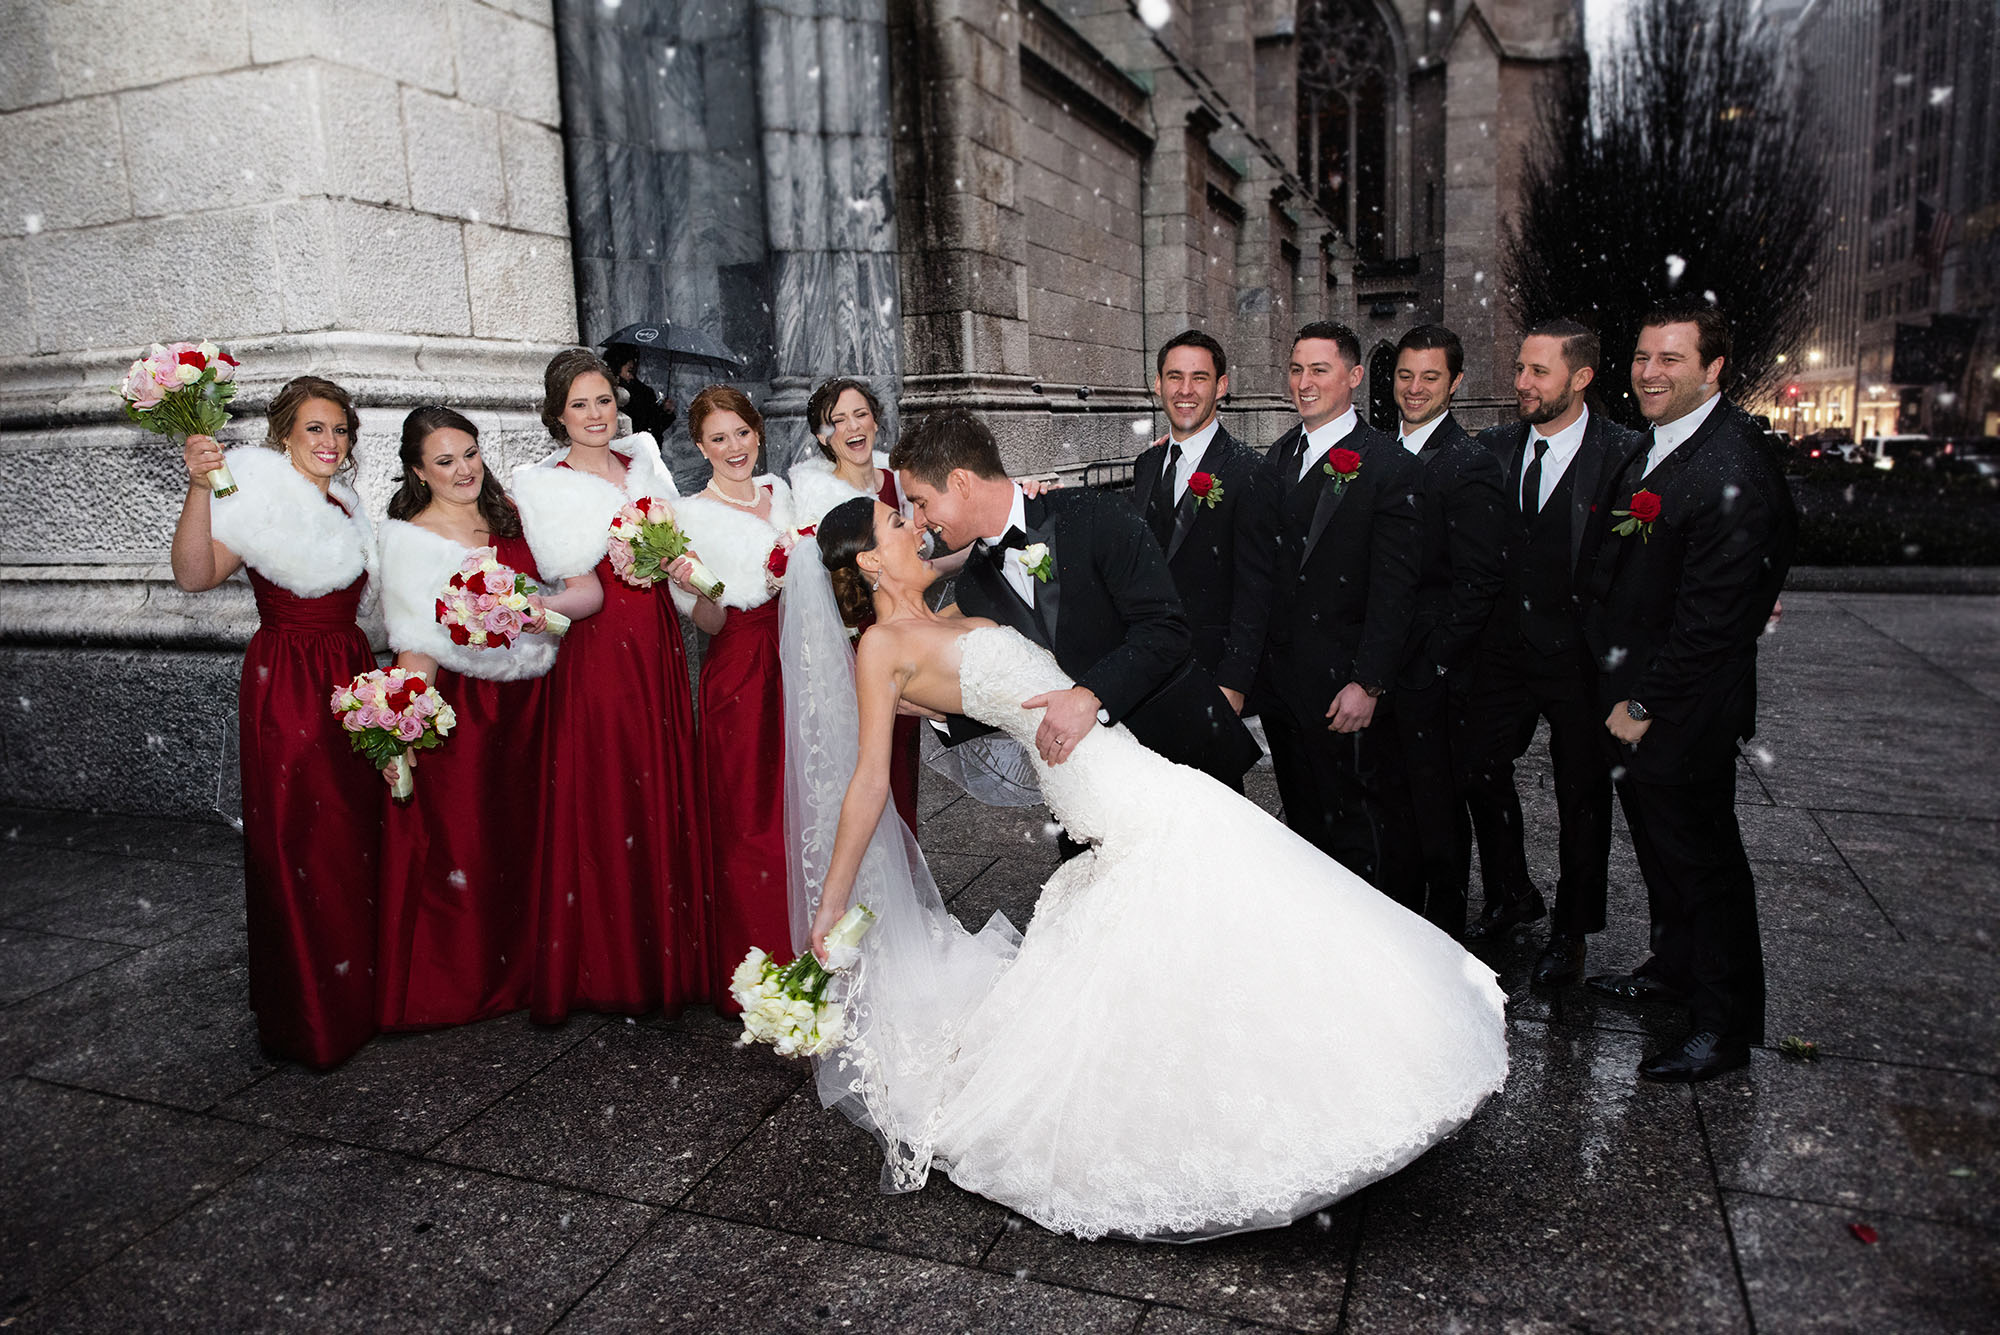 st patricks cathedral wedding 3.jpg